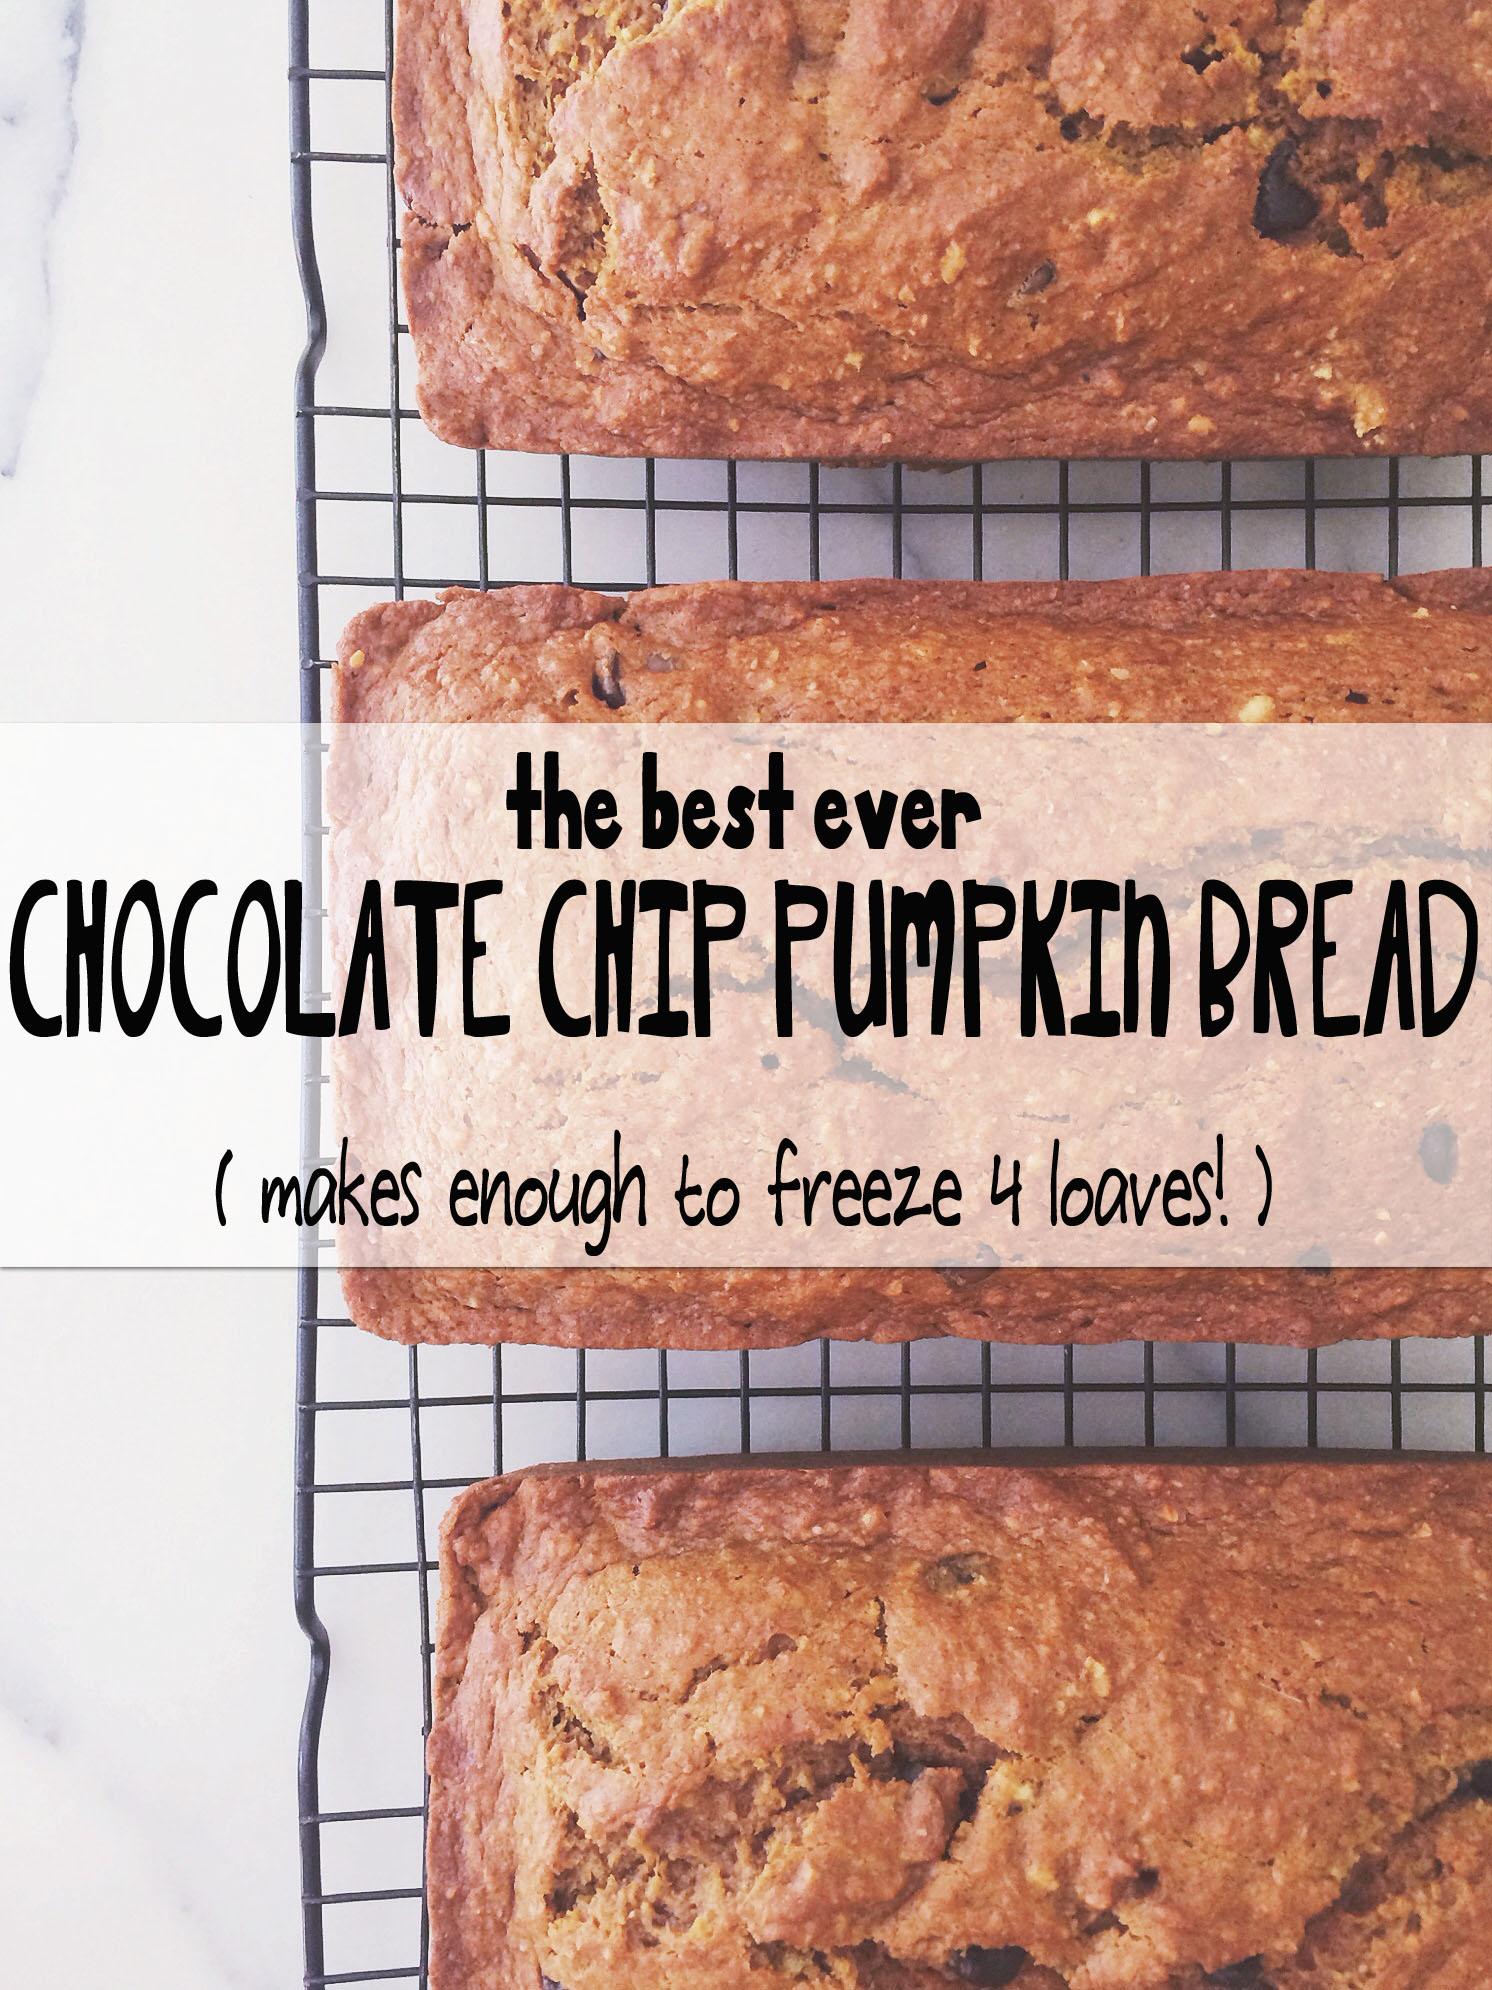 The Best Ever Chocolate Chip Pumpkin Bread